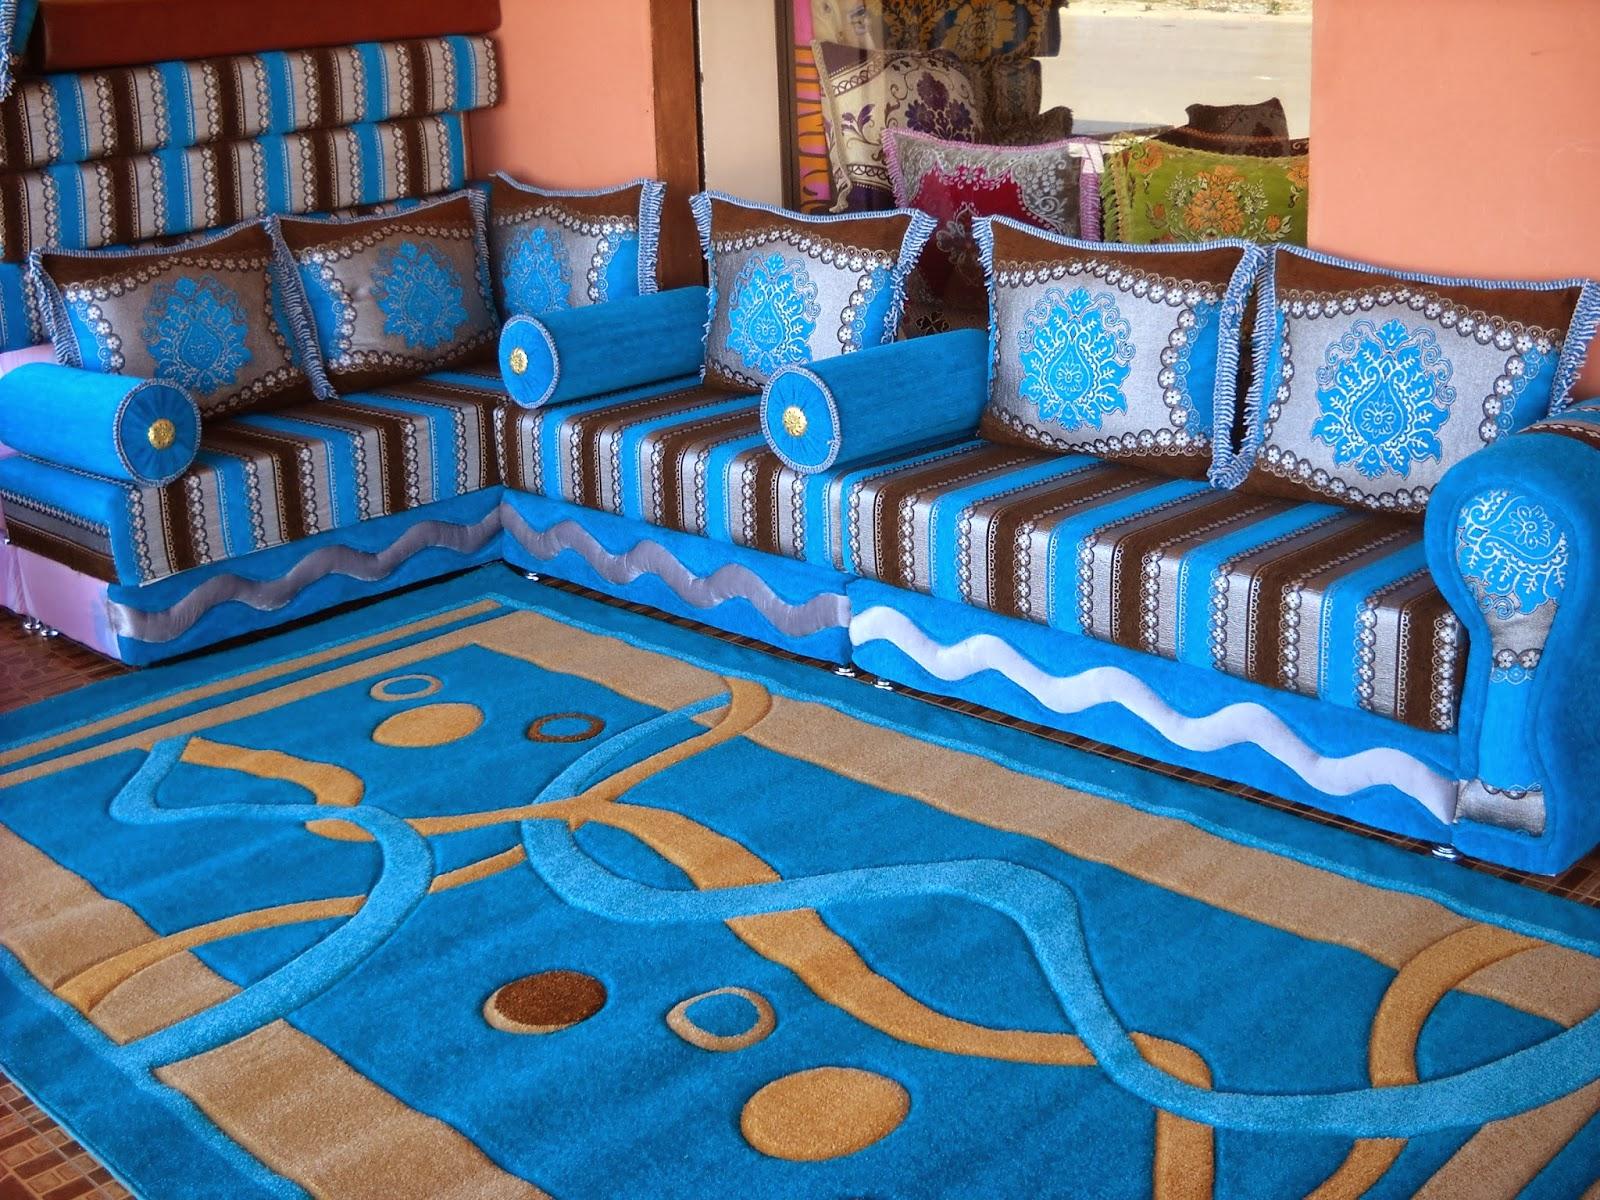 salon marocain salon moderne lombards - Salon Marocain Salon Moderne